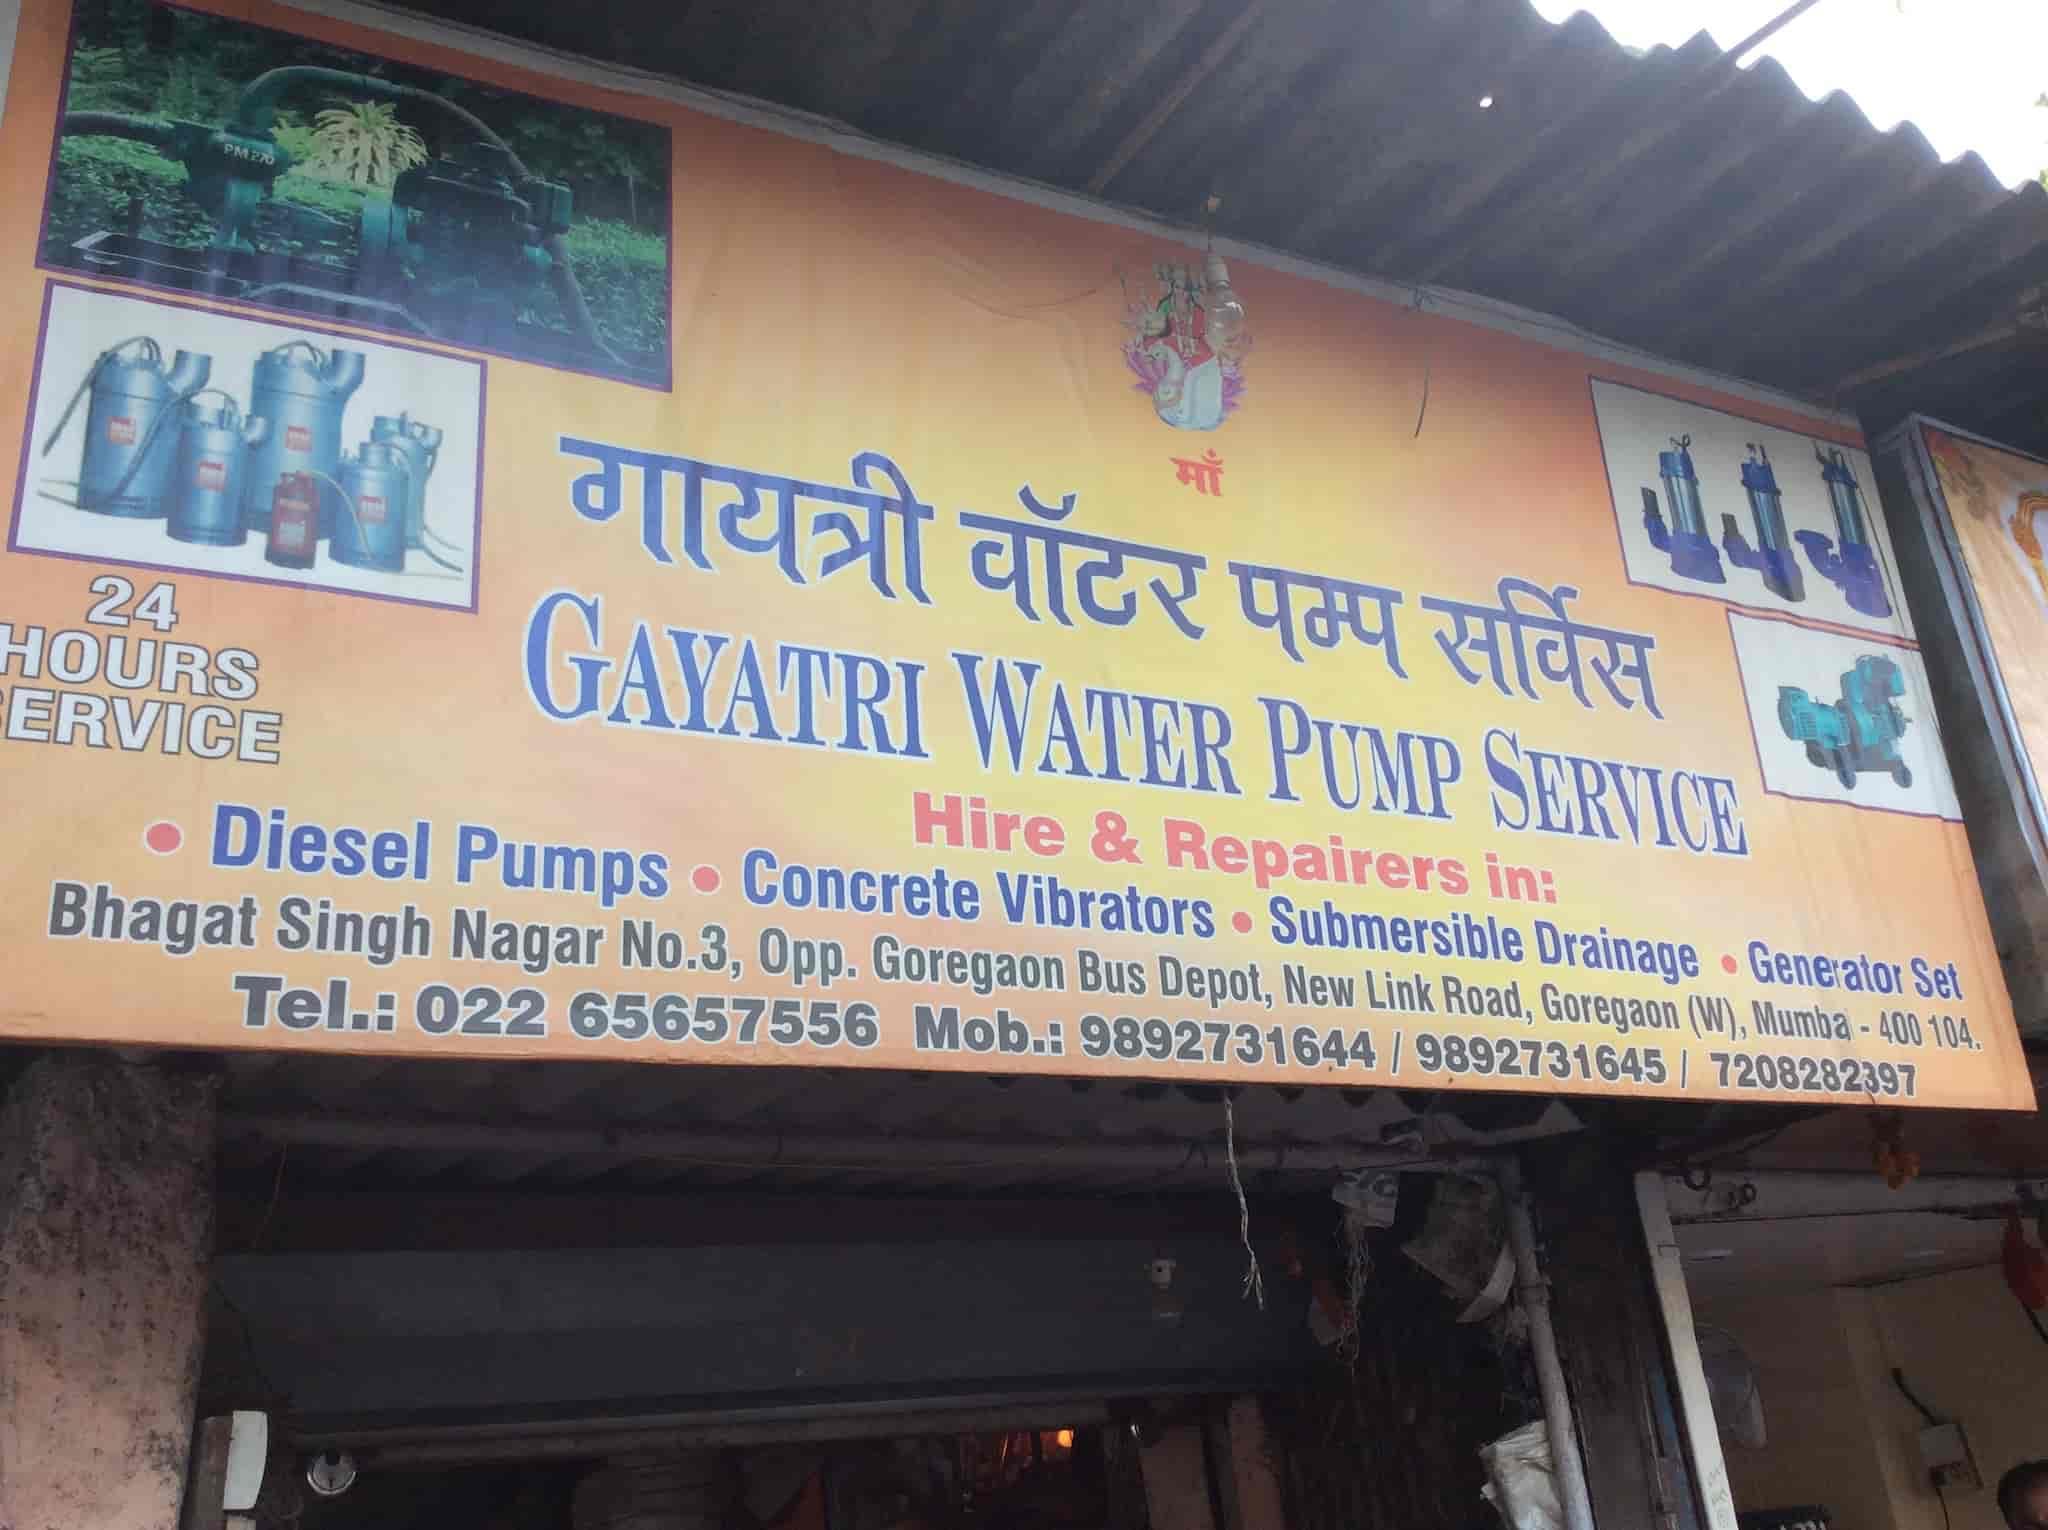 Gayatri Water Pump Service